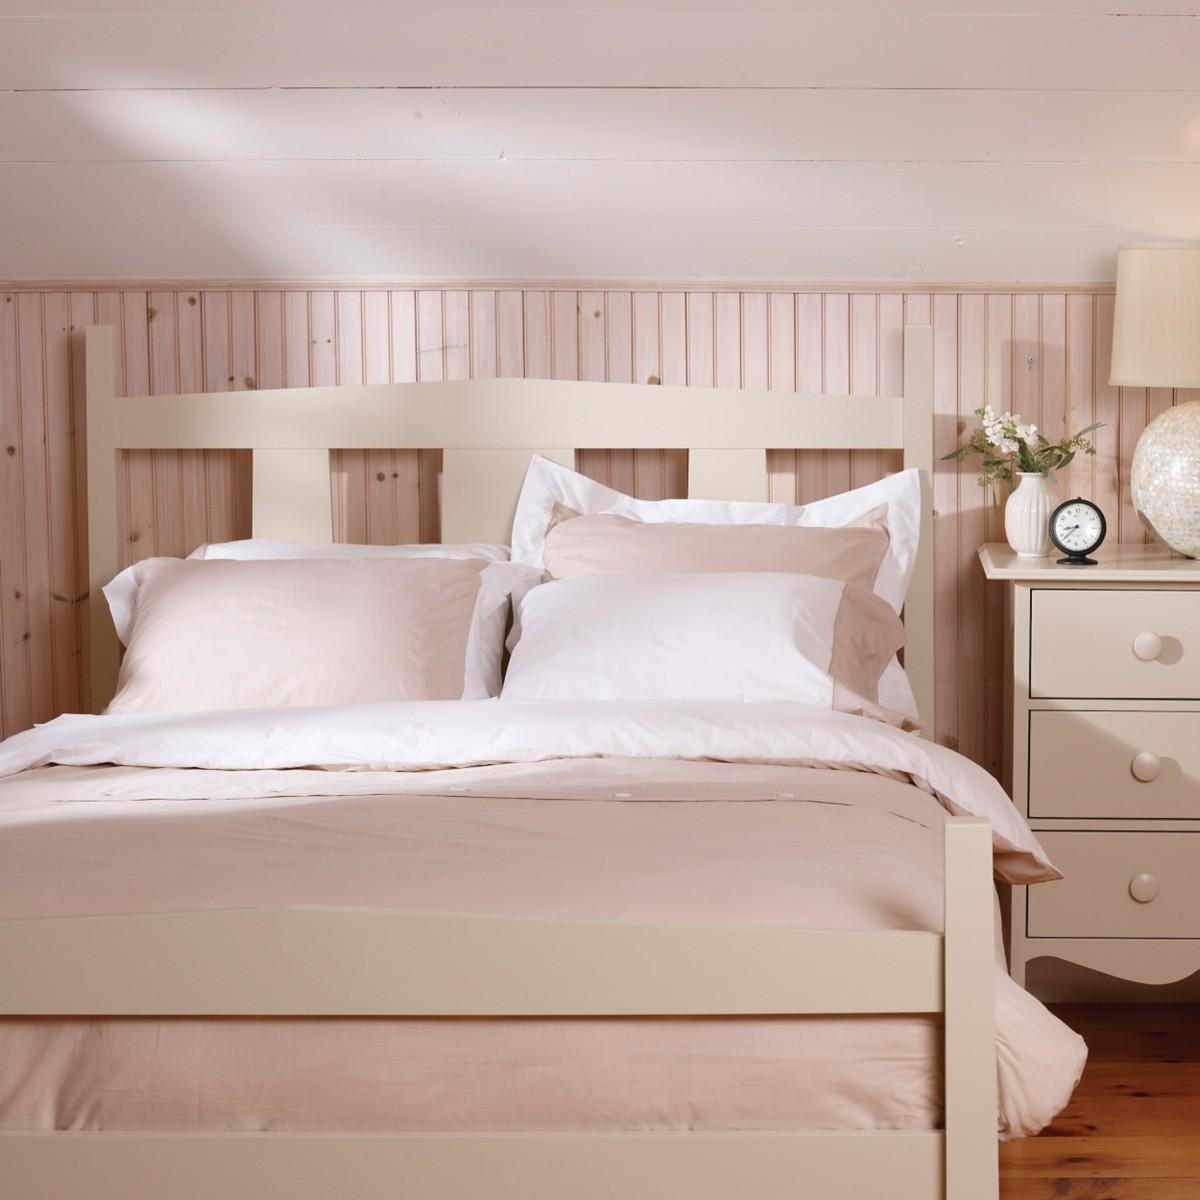 Meriweather Bed